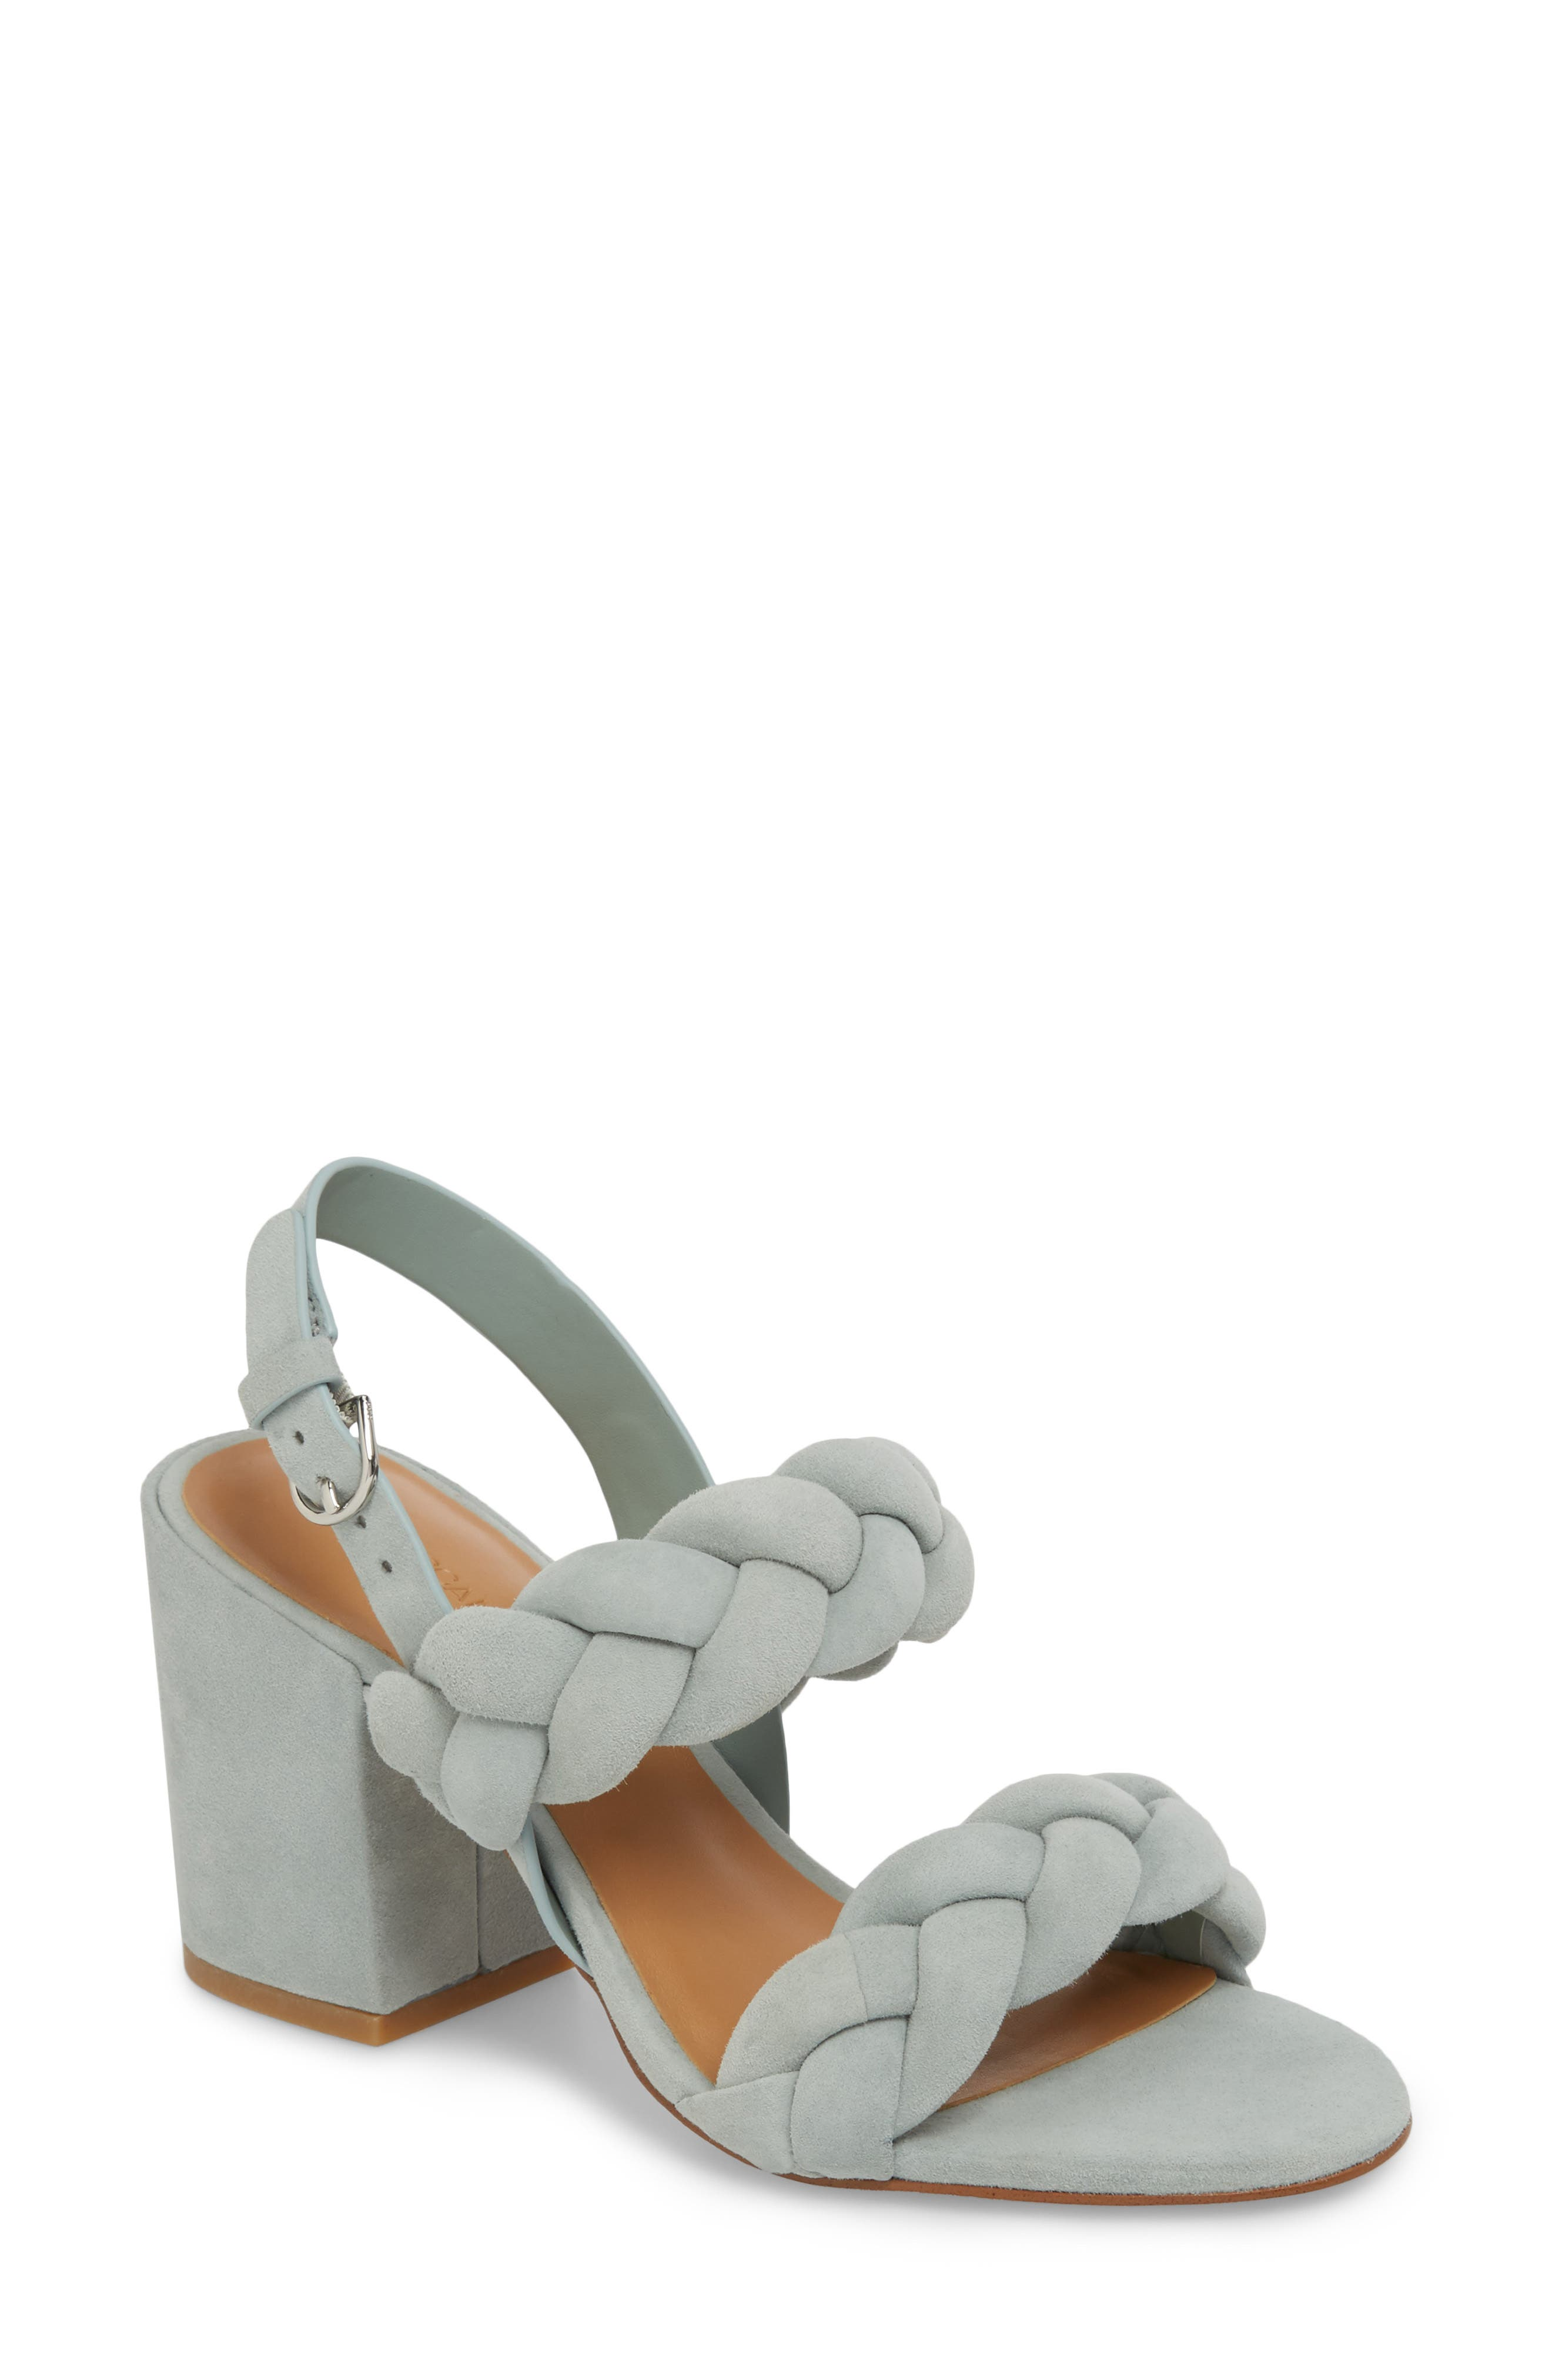 Rebecca Minkoff Candance Block Heel Sandal, Green